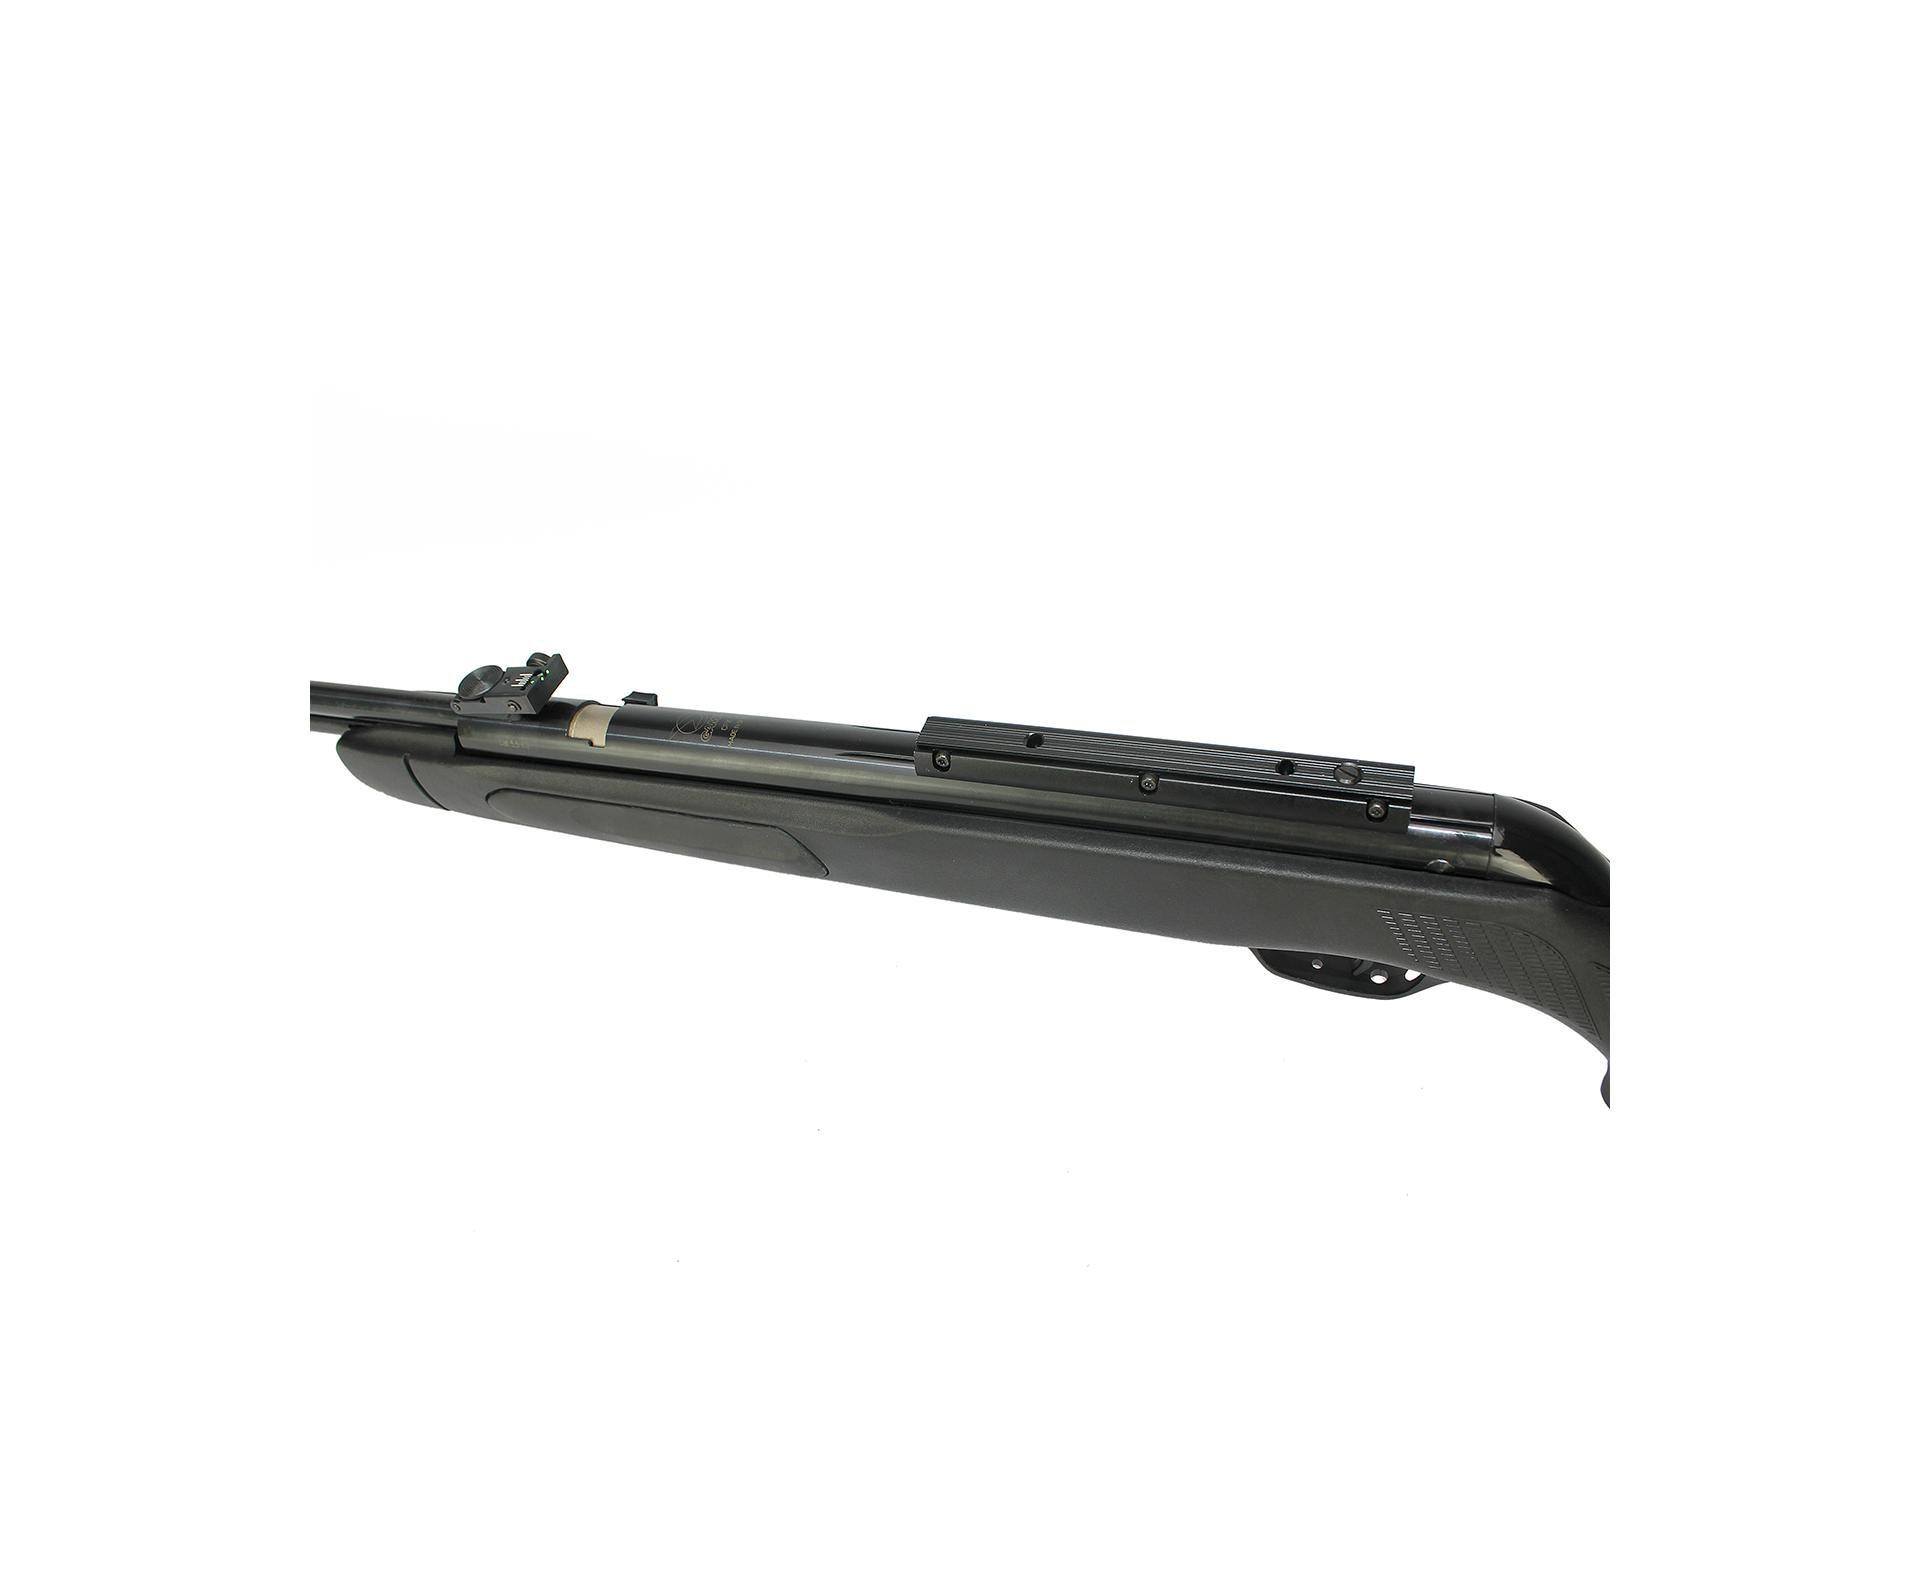 Carabina De Pressão Cfx Gamo Cal 5,5mm